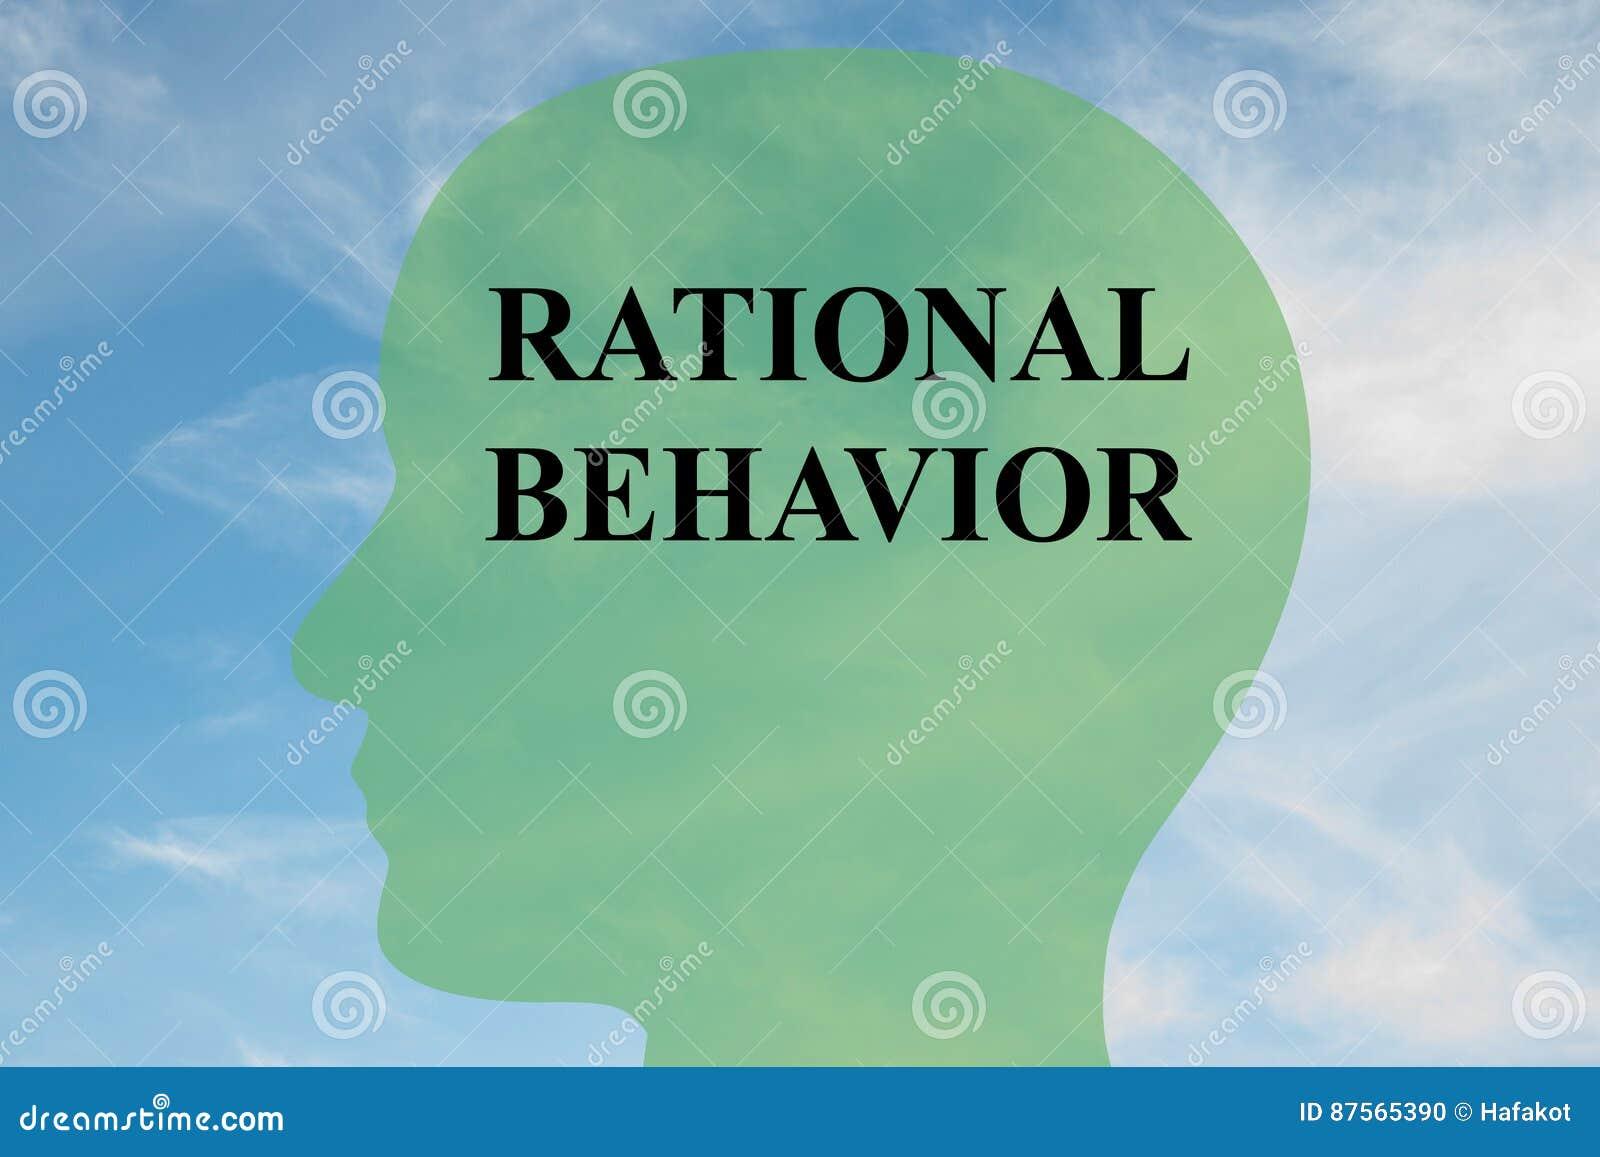 Rational Behavior concept